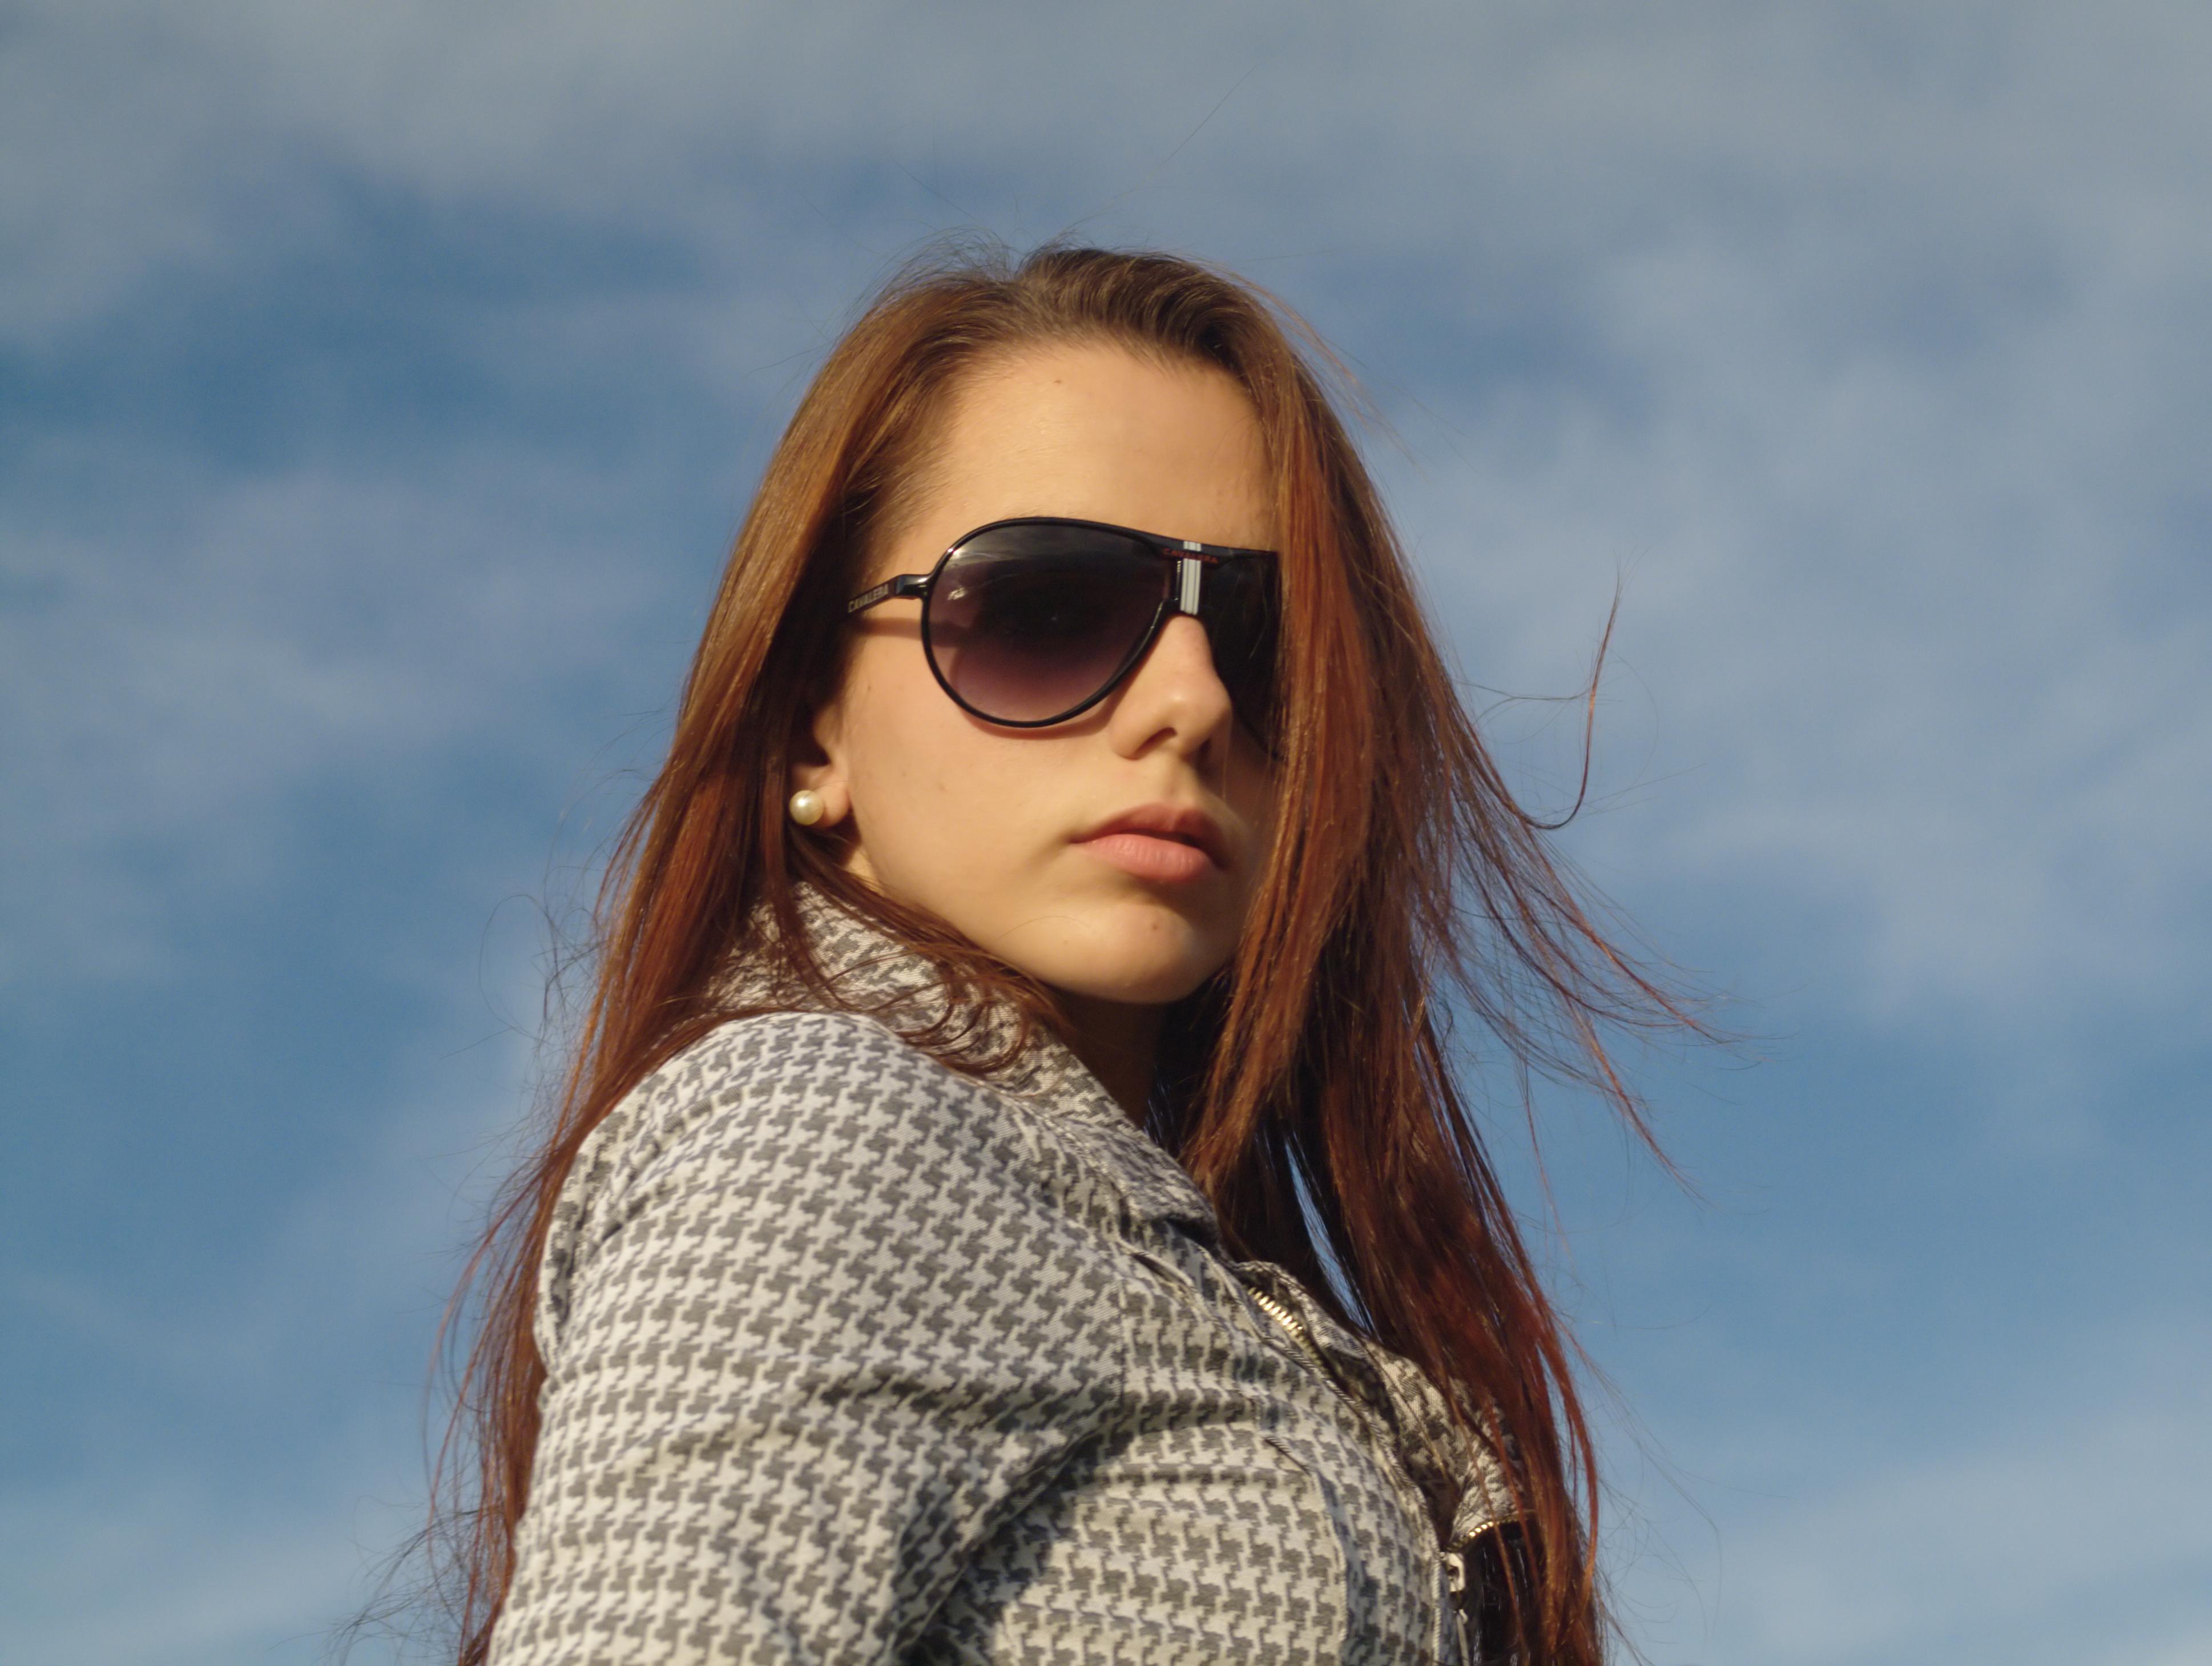 Photographe modele lyon valence